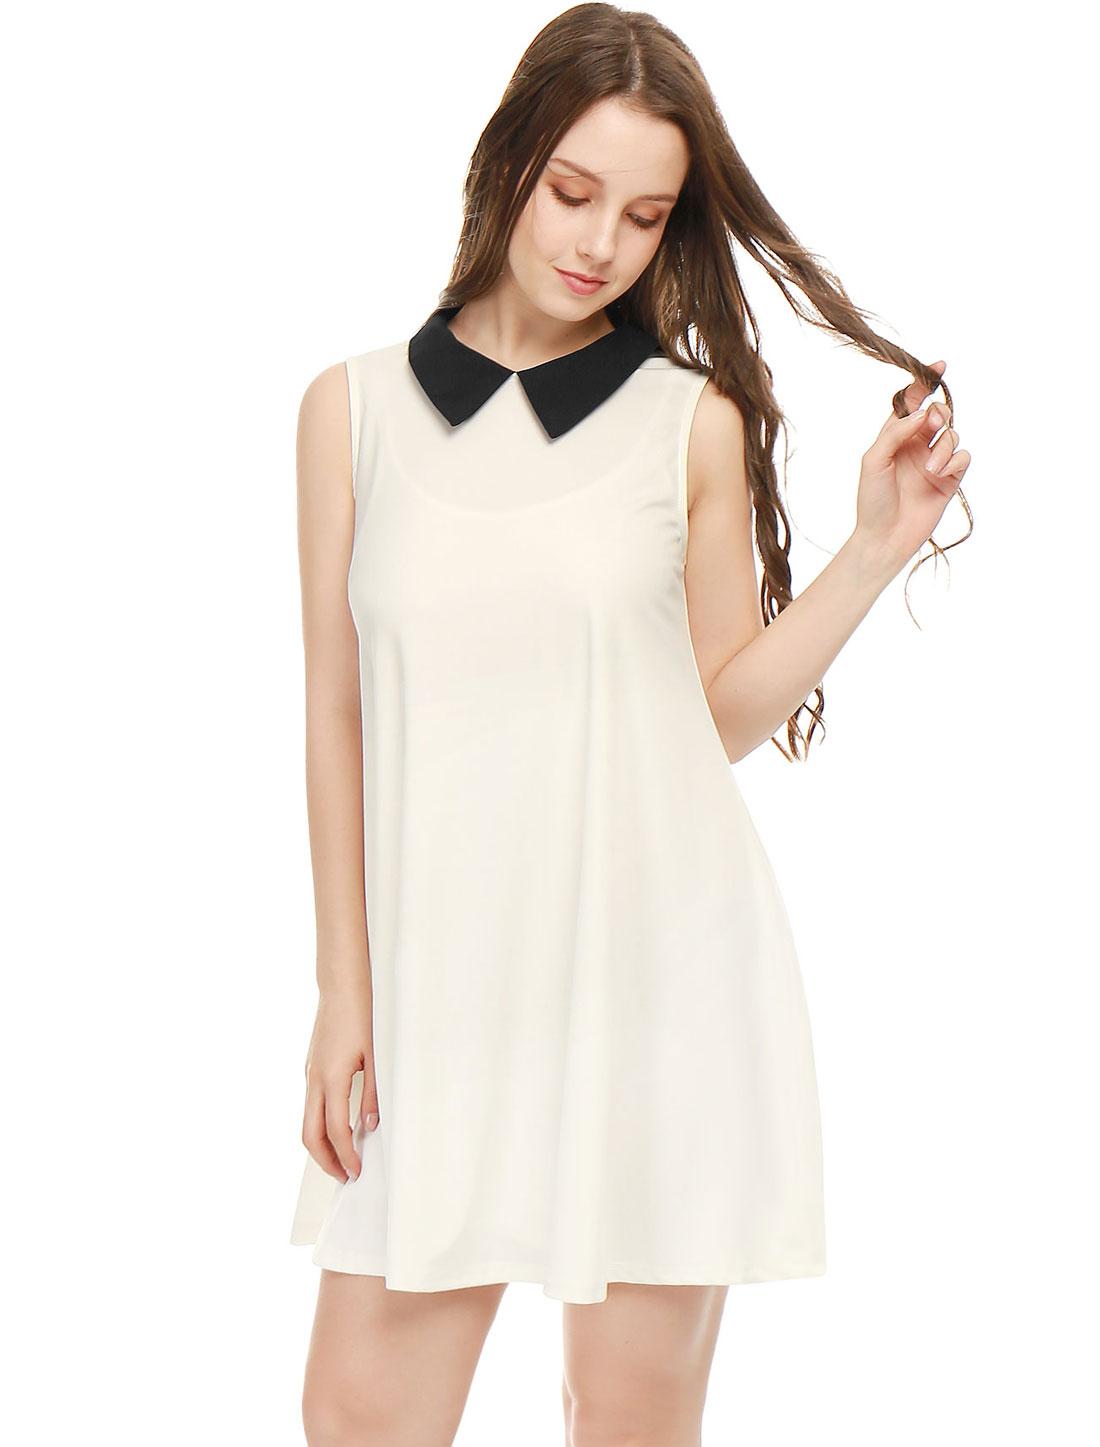 Women Contrast Color Peter Pan Collar Sleeveless Swing Dress White L